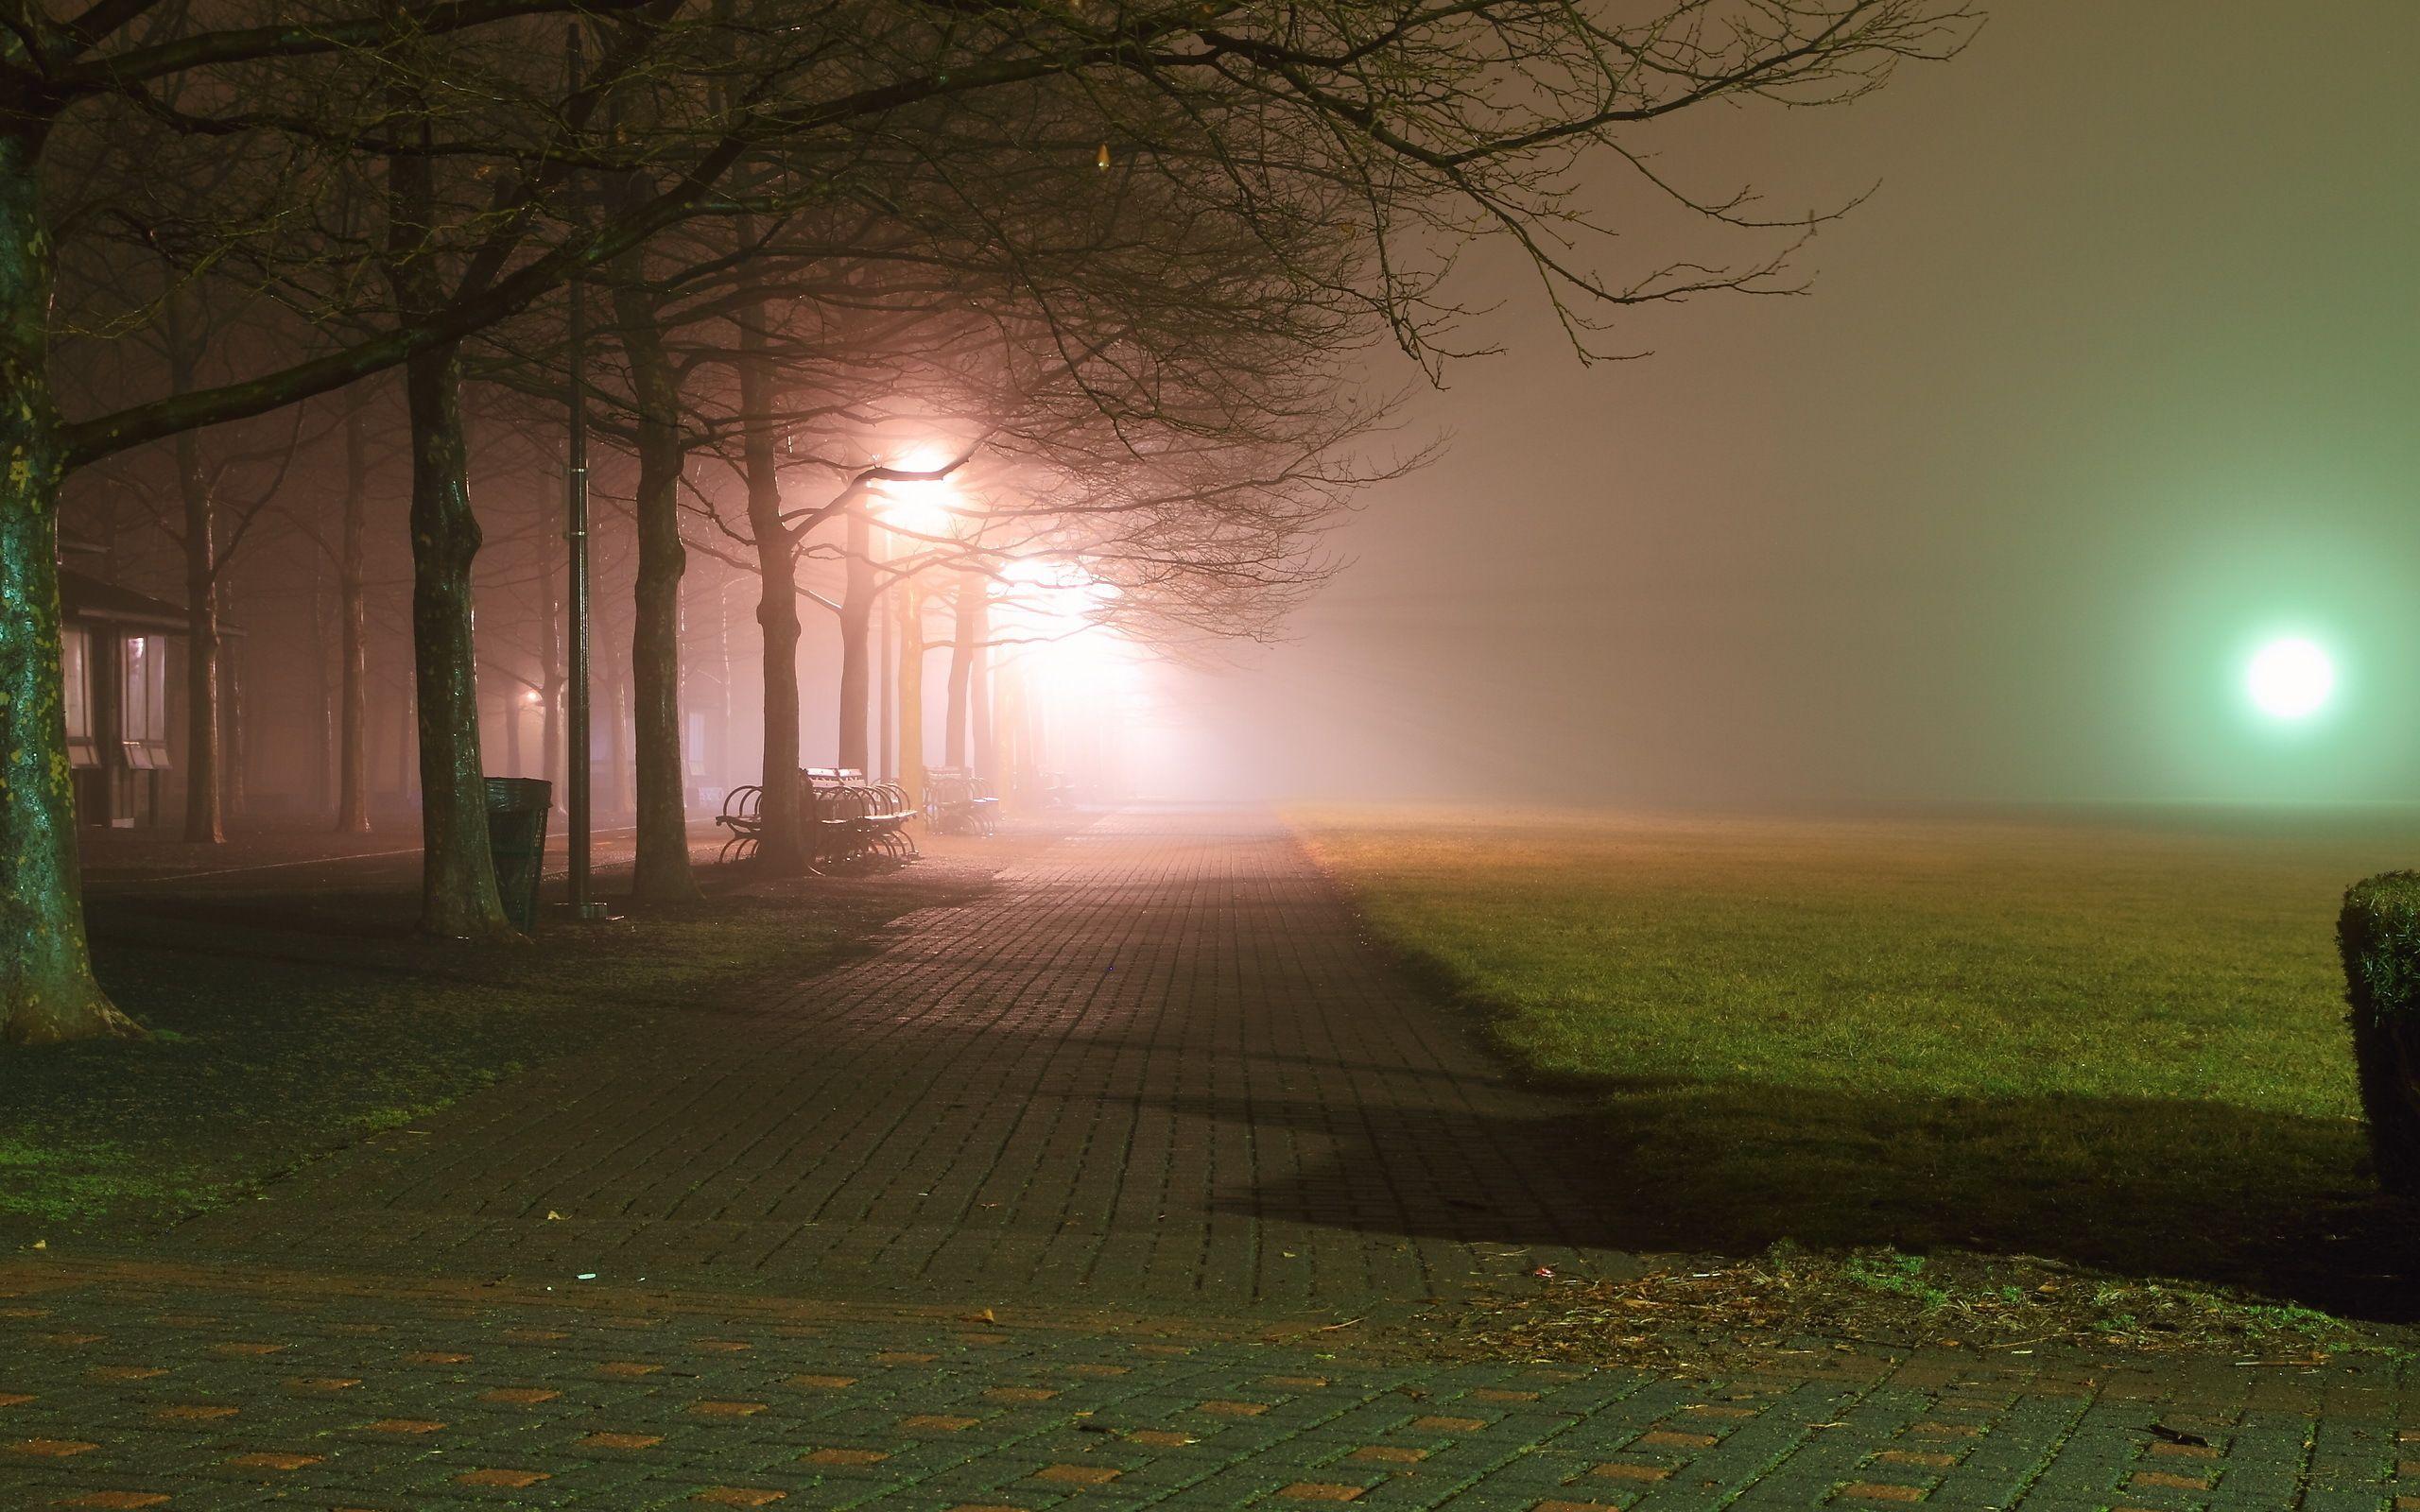 Park Bench At Night City Aeyaey Park Night Bench Fog Sidewalk